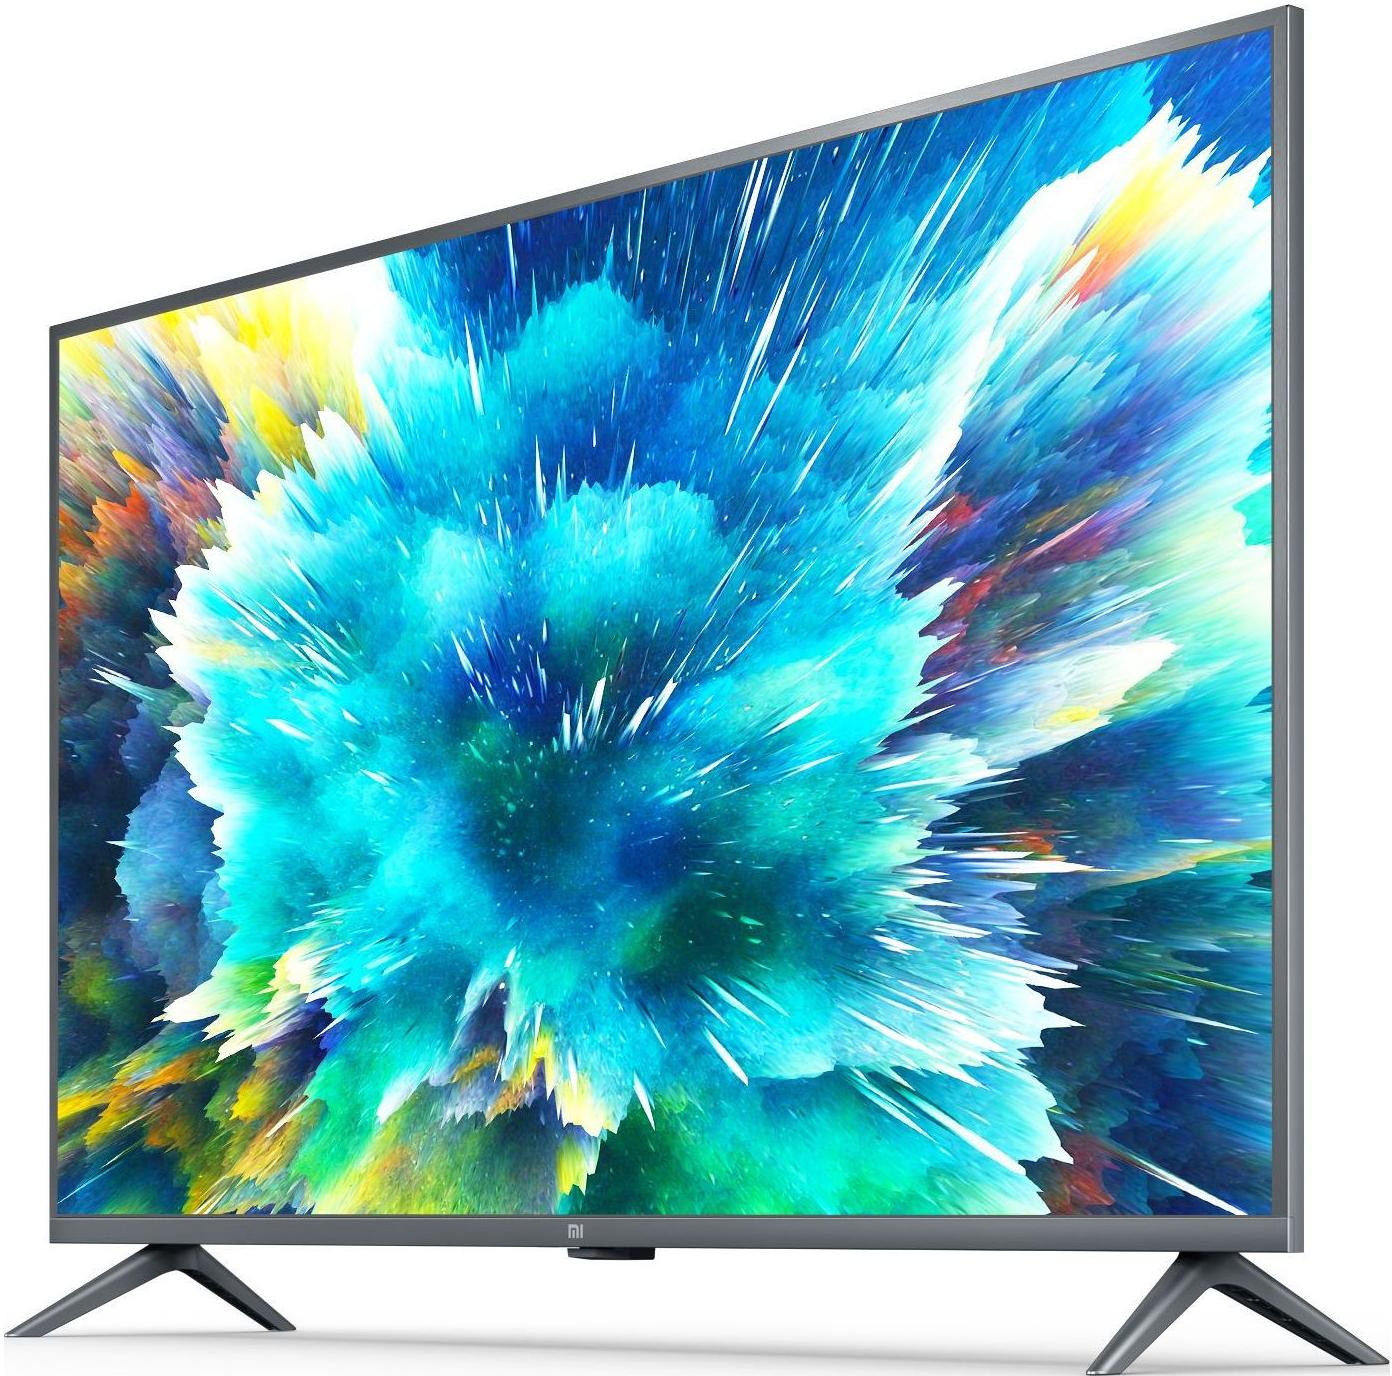 Xiaomi Mi TV 4S 43 T2 42.5